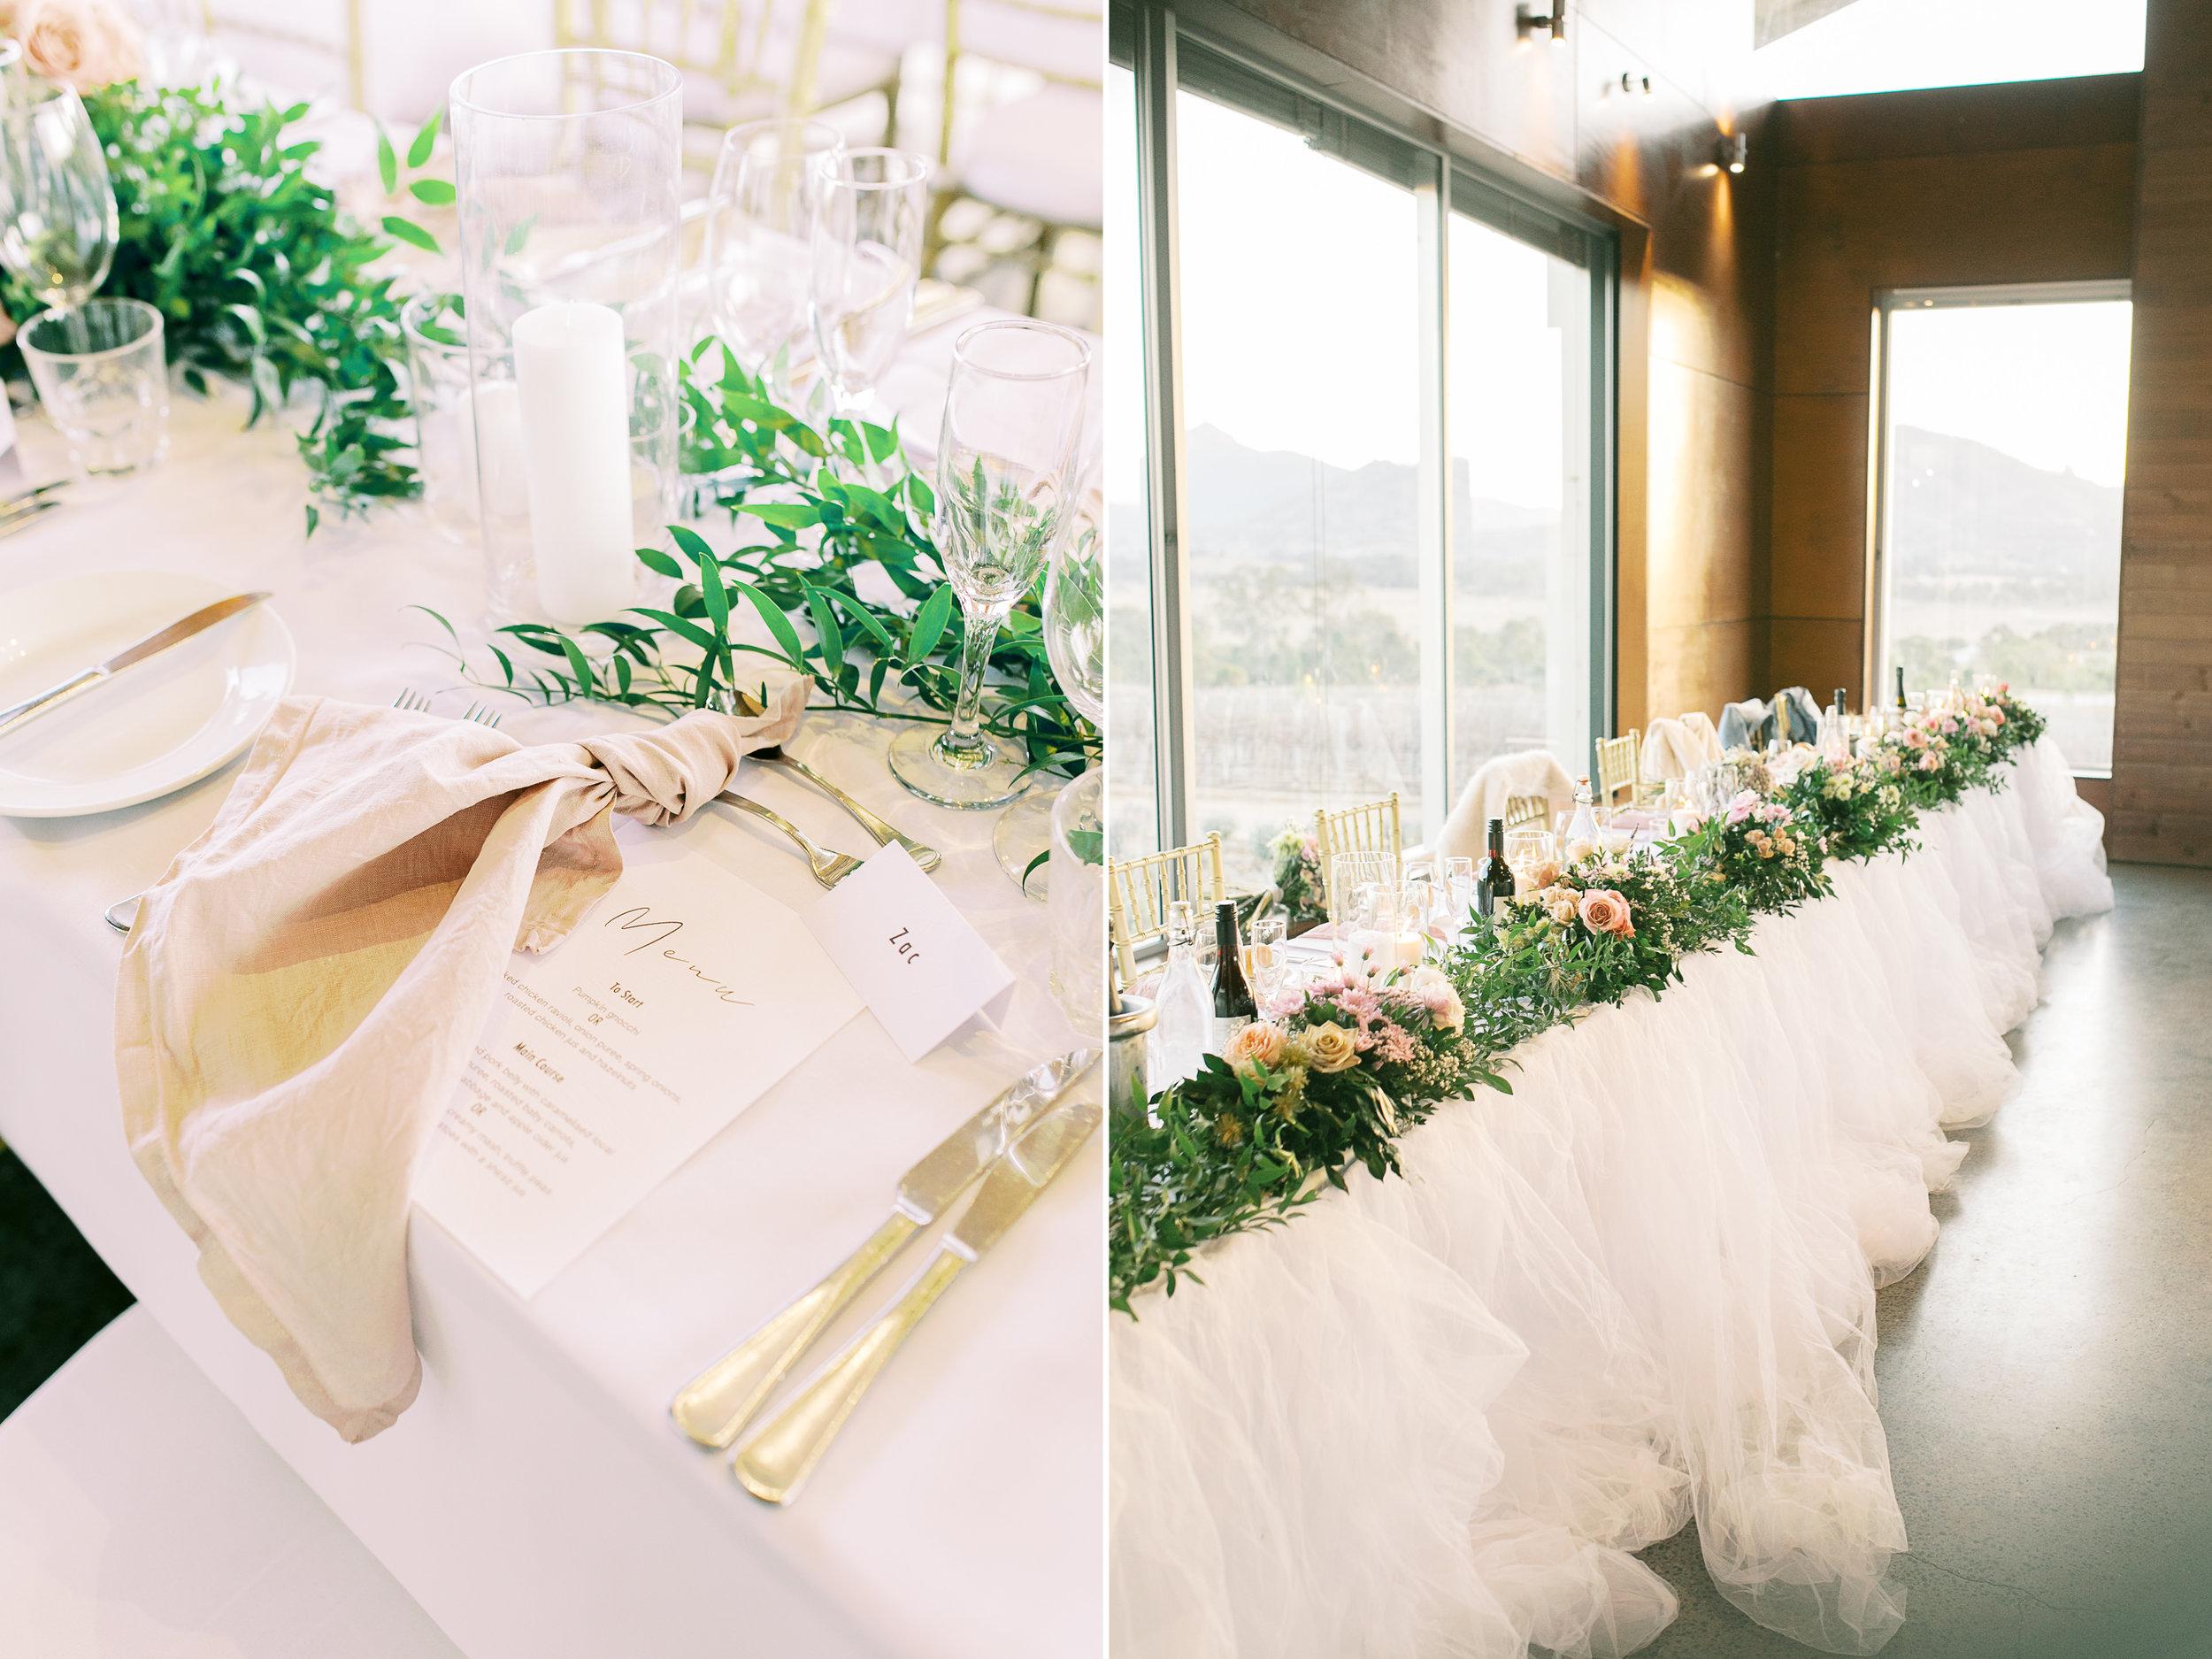 kooroomba-lavendar-farm-film-photography-wedding-photography-romantic-24.jpg